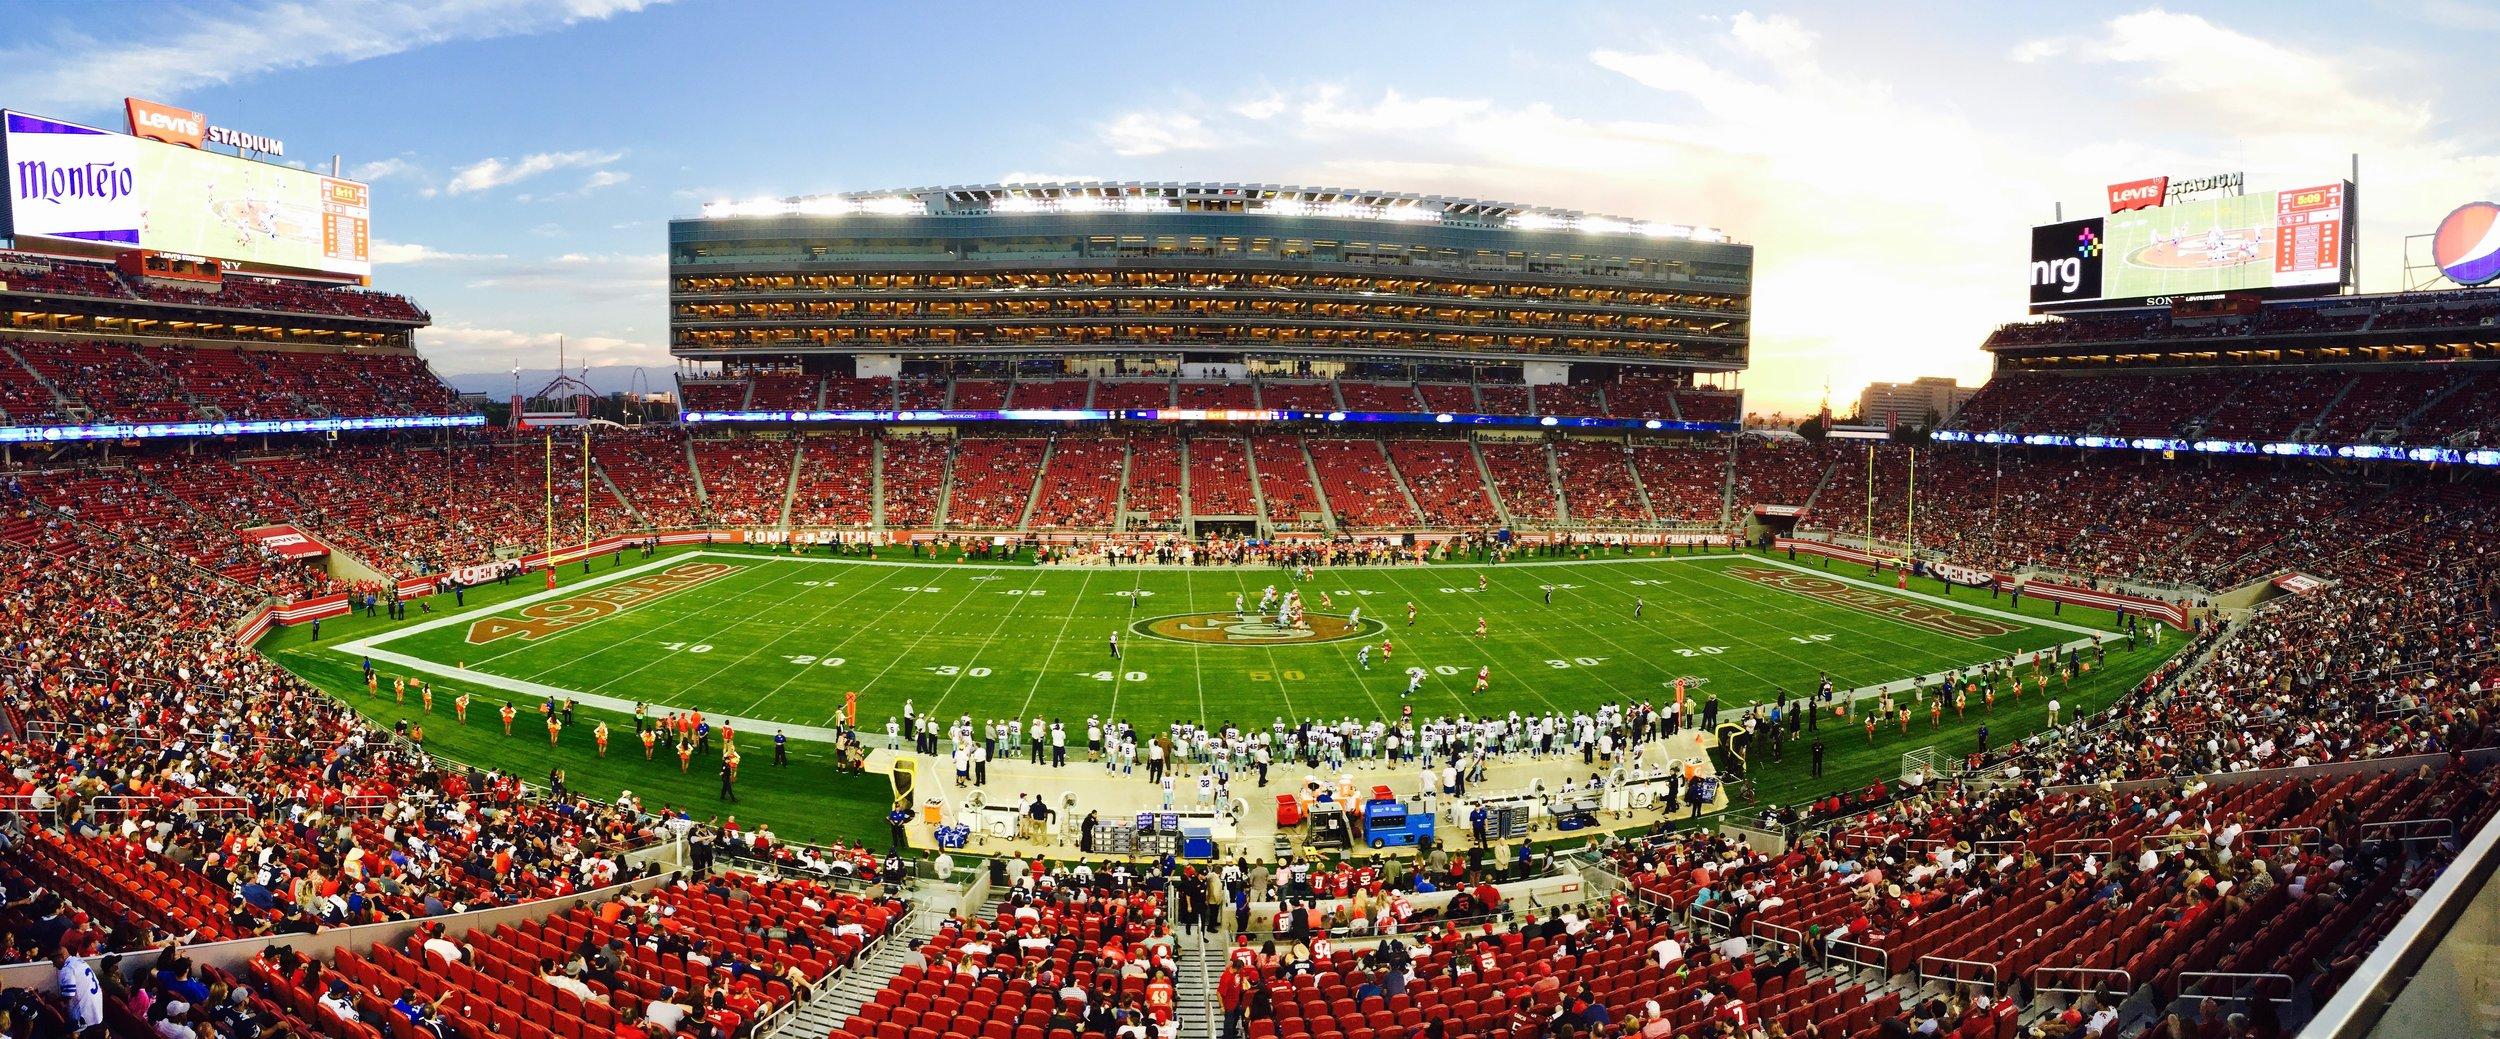 Super Bowl LIV - Hard Rock Stadium, Miami, Florida, USASunday 2 February 2020